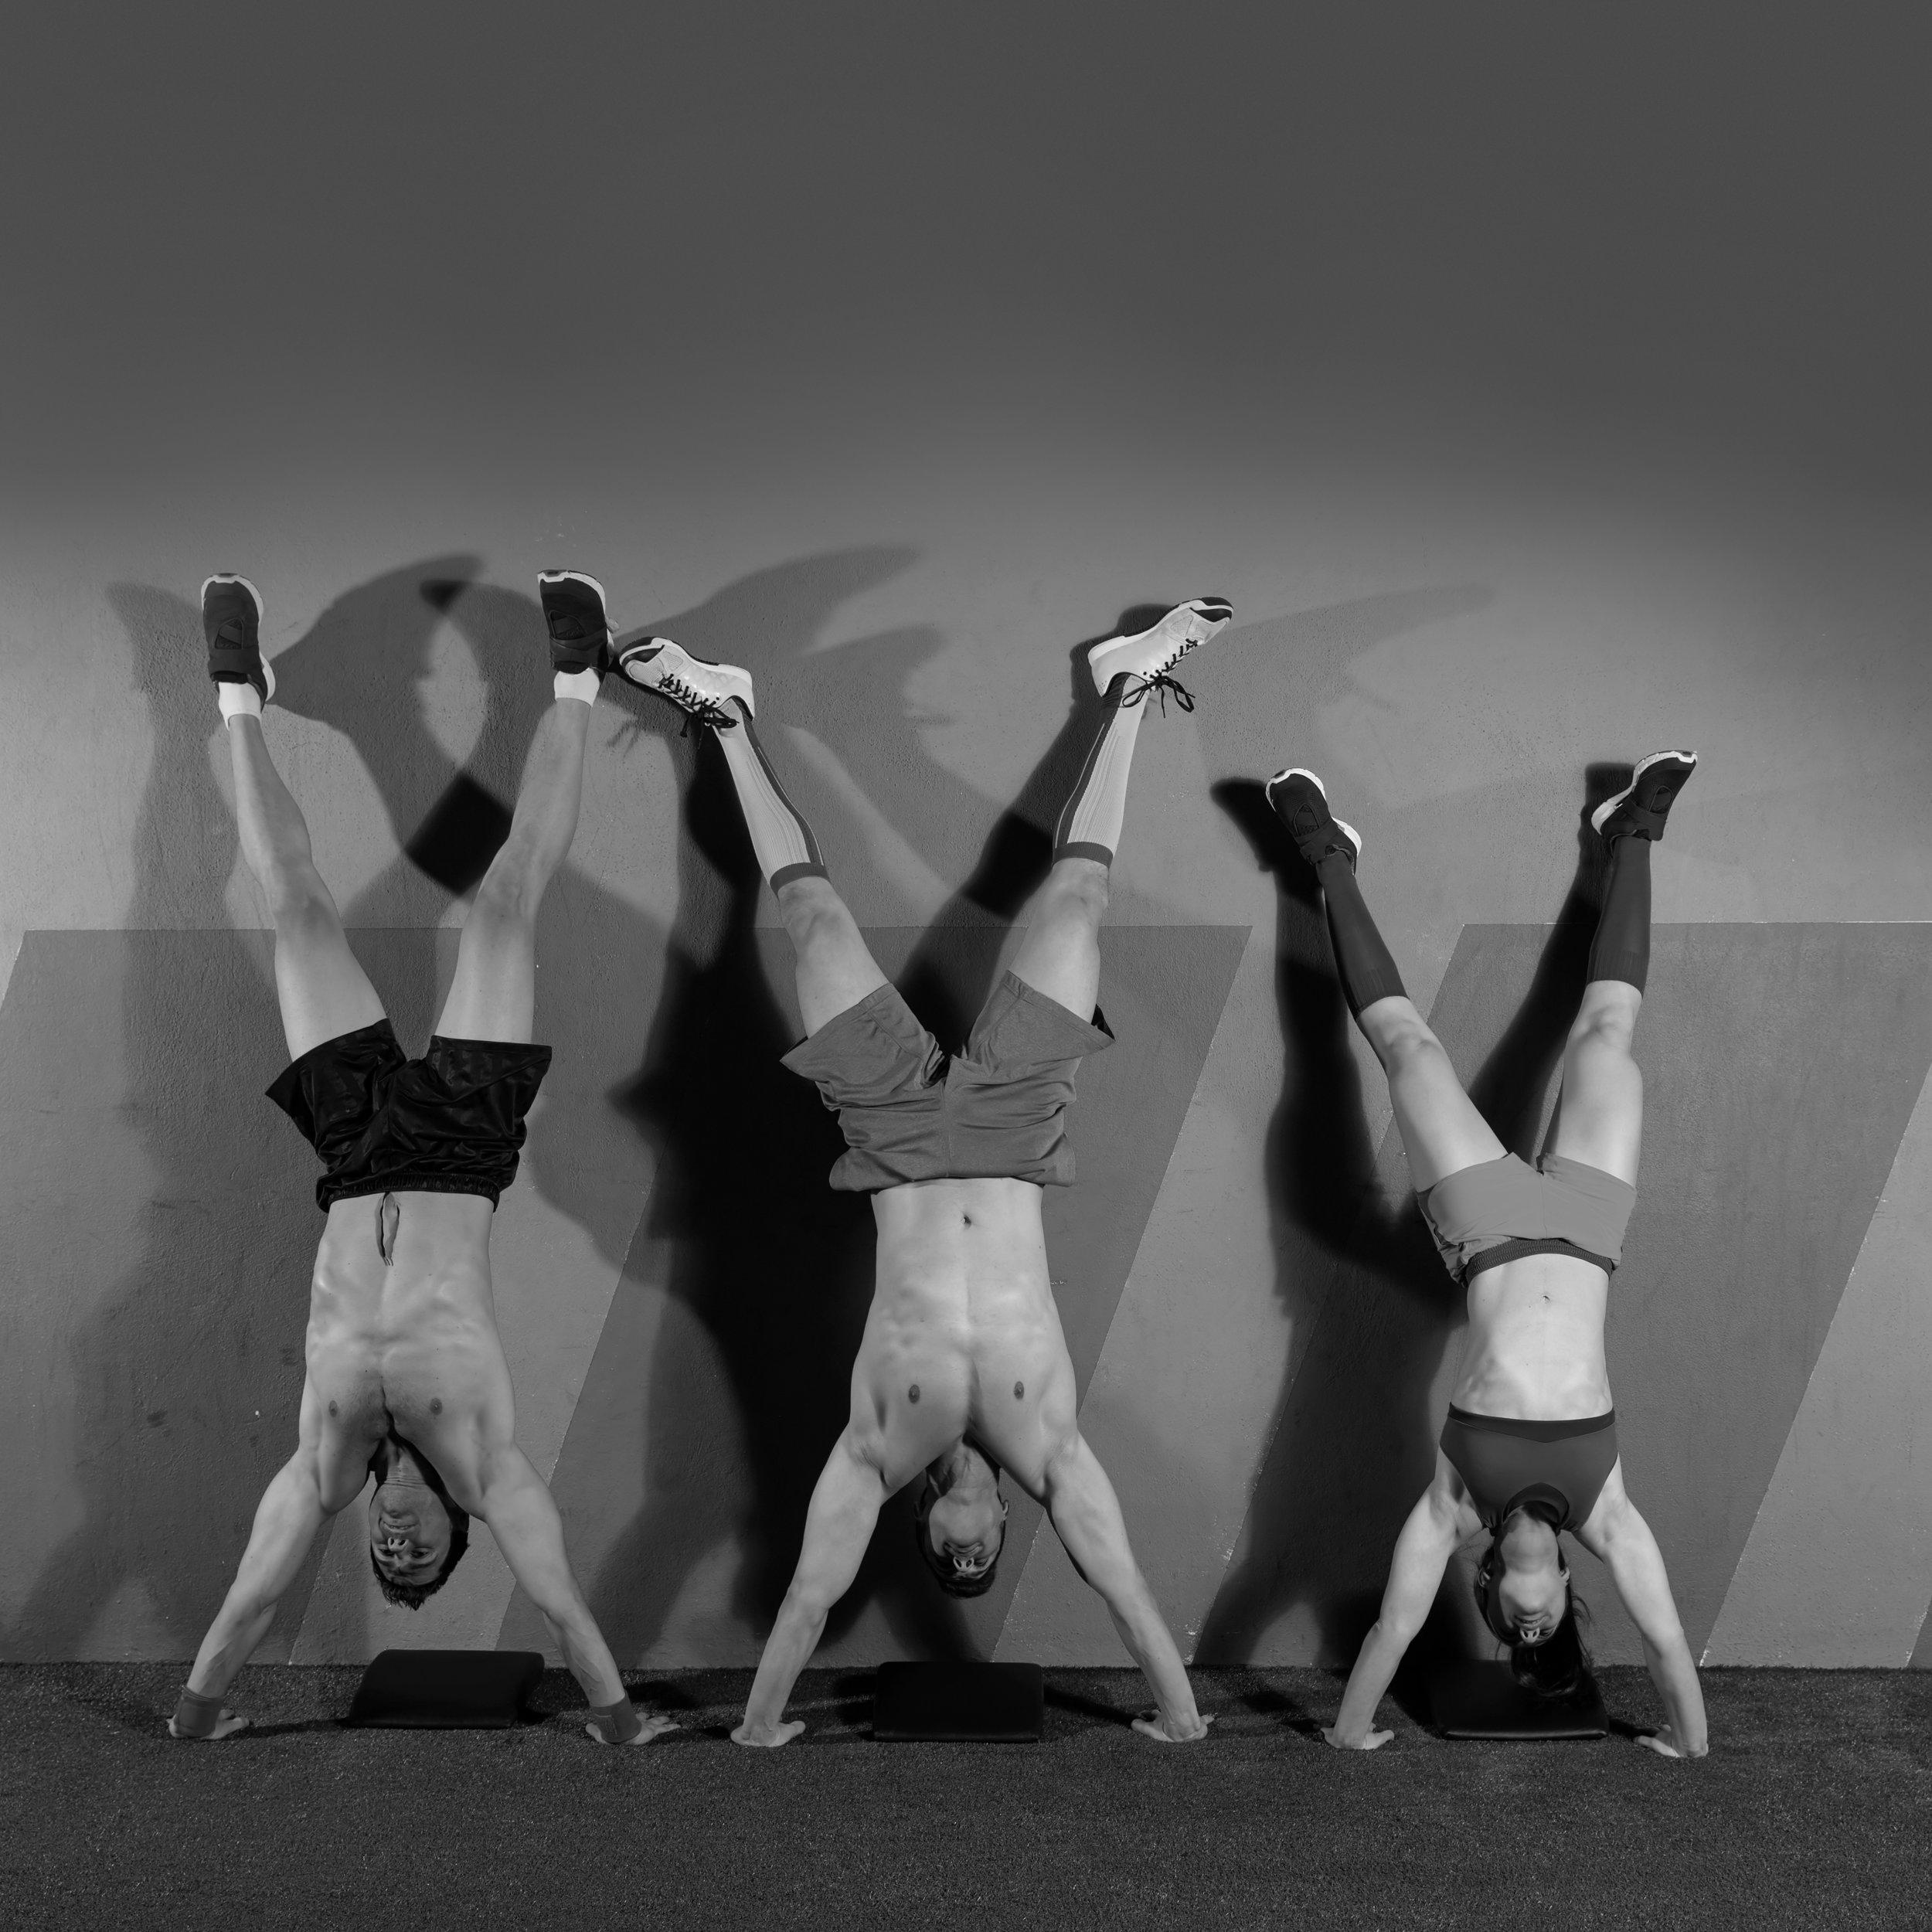 gymnastics in crossfit, at crossfit Chiltern in Amersham, bucks